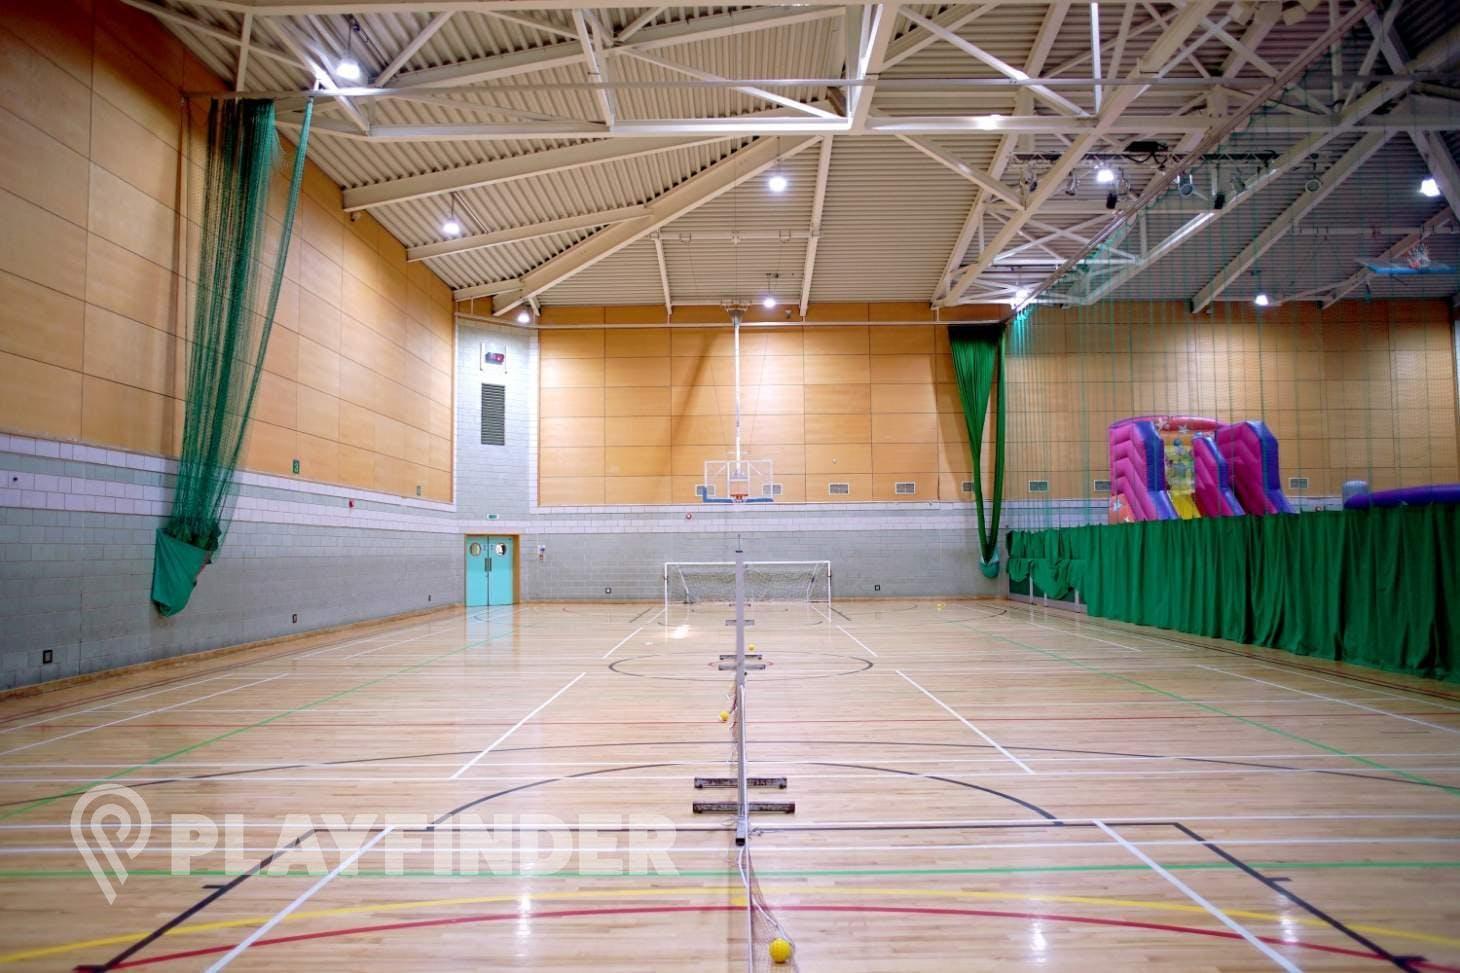 Windsor Leisure Centre Indoor basketball court